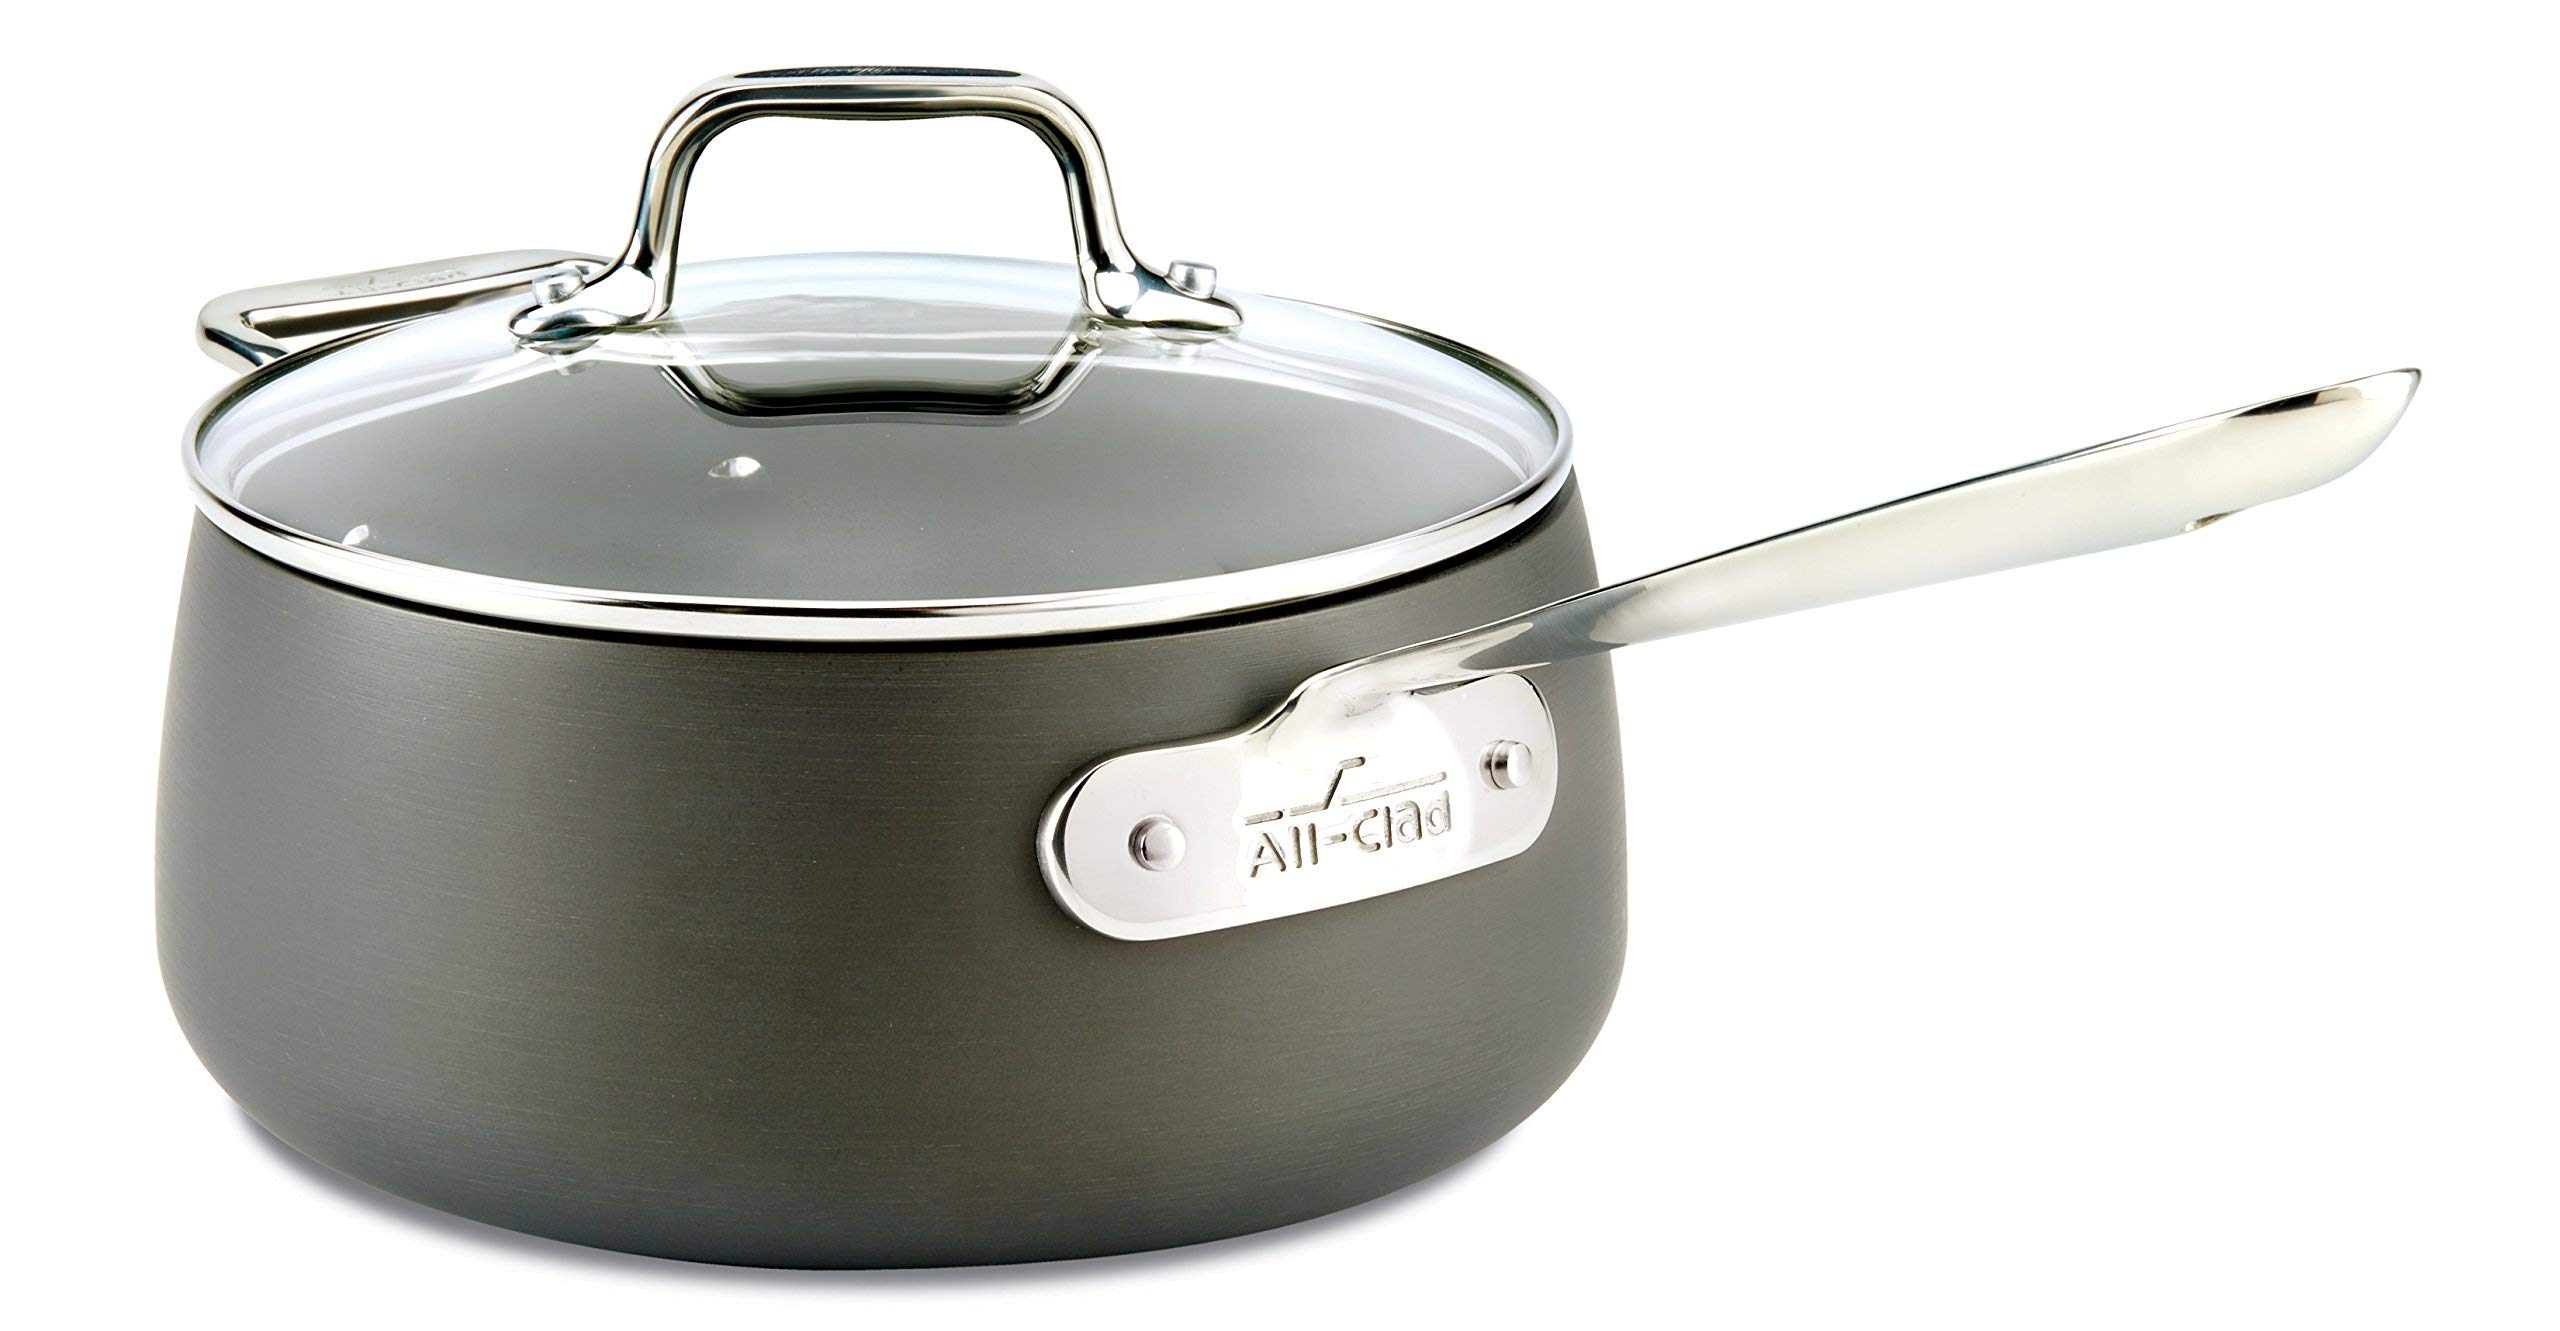 All-Clad E7852464 HA1 Hard Anodized Nonstick Dishwasher Safe PFOA Free Sauce Pan Cookware, 3.5-Quart, Black (Renewed)